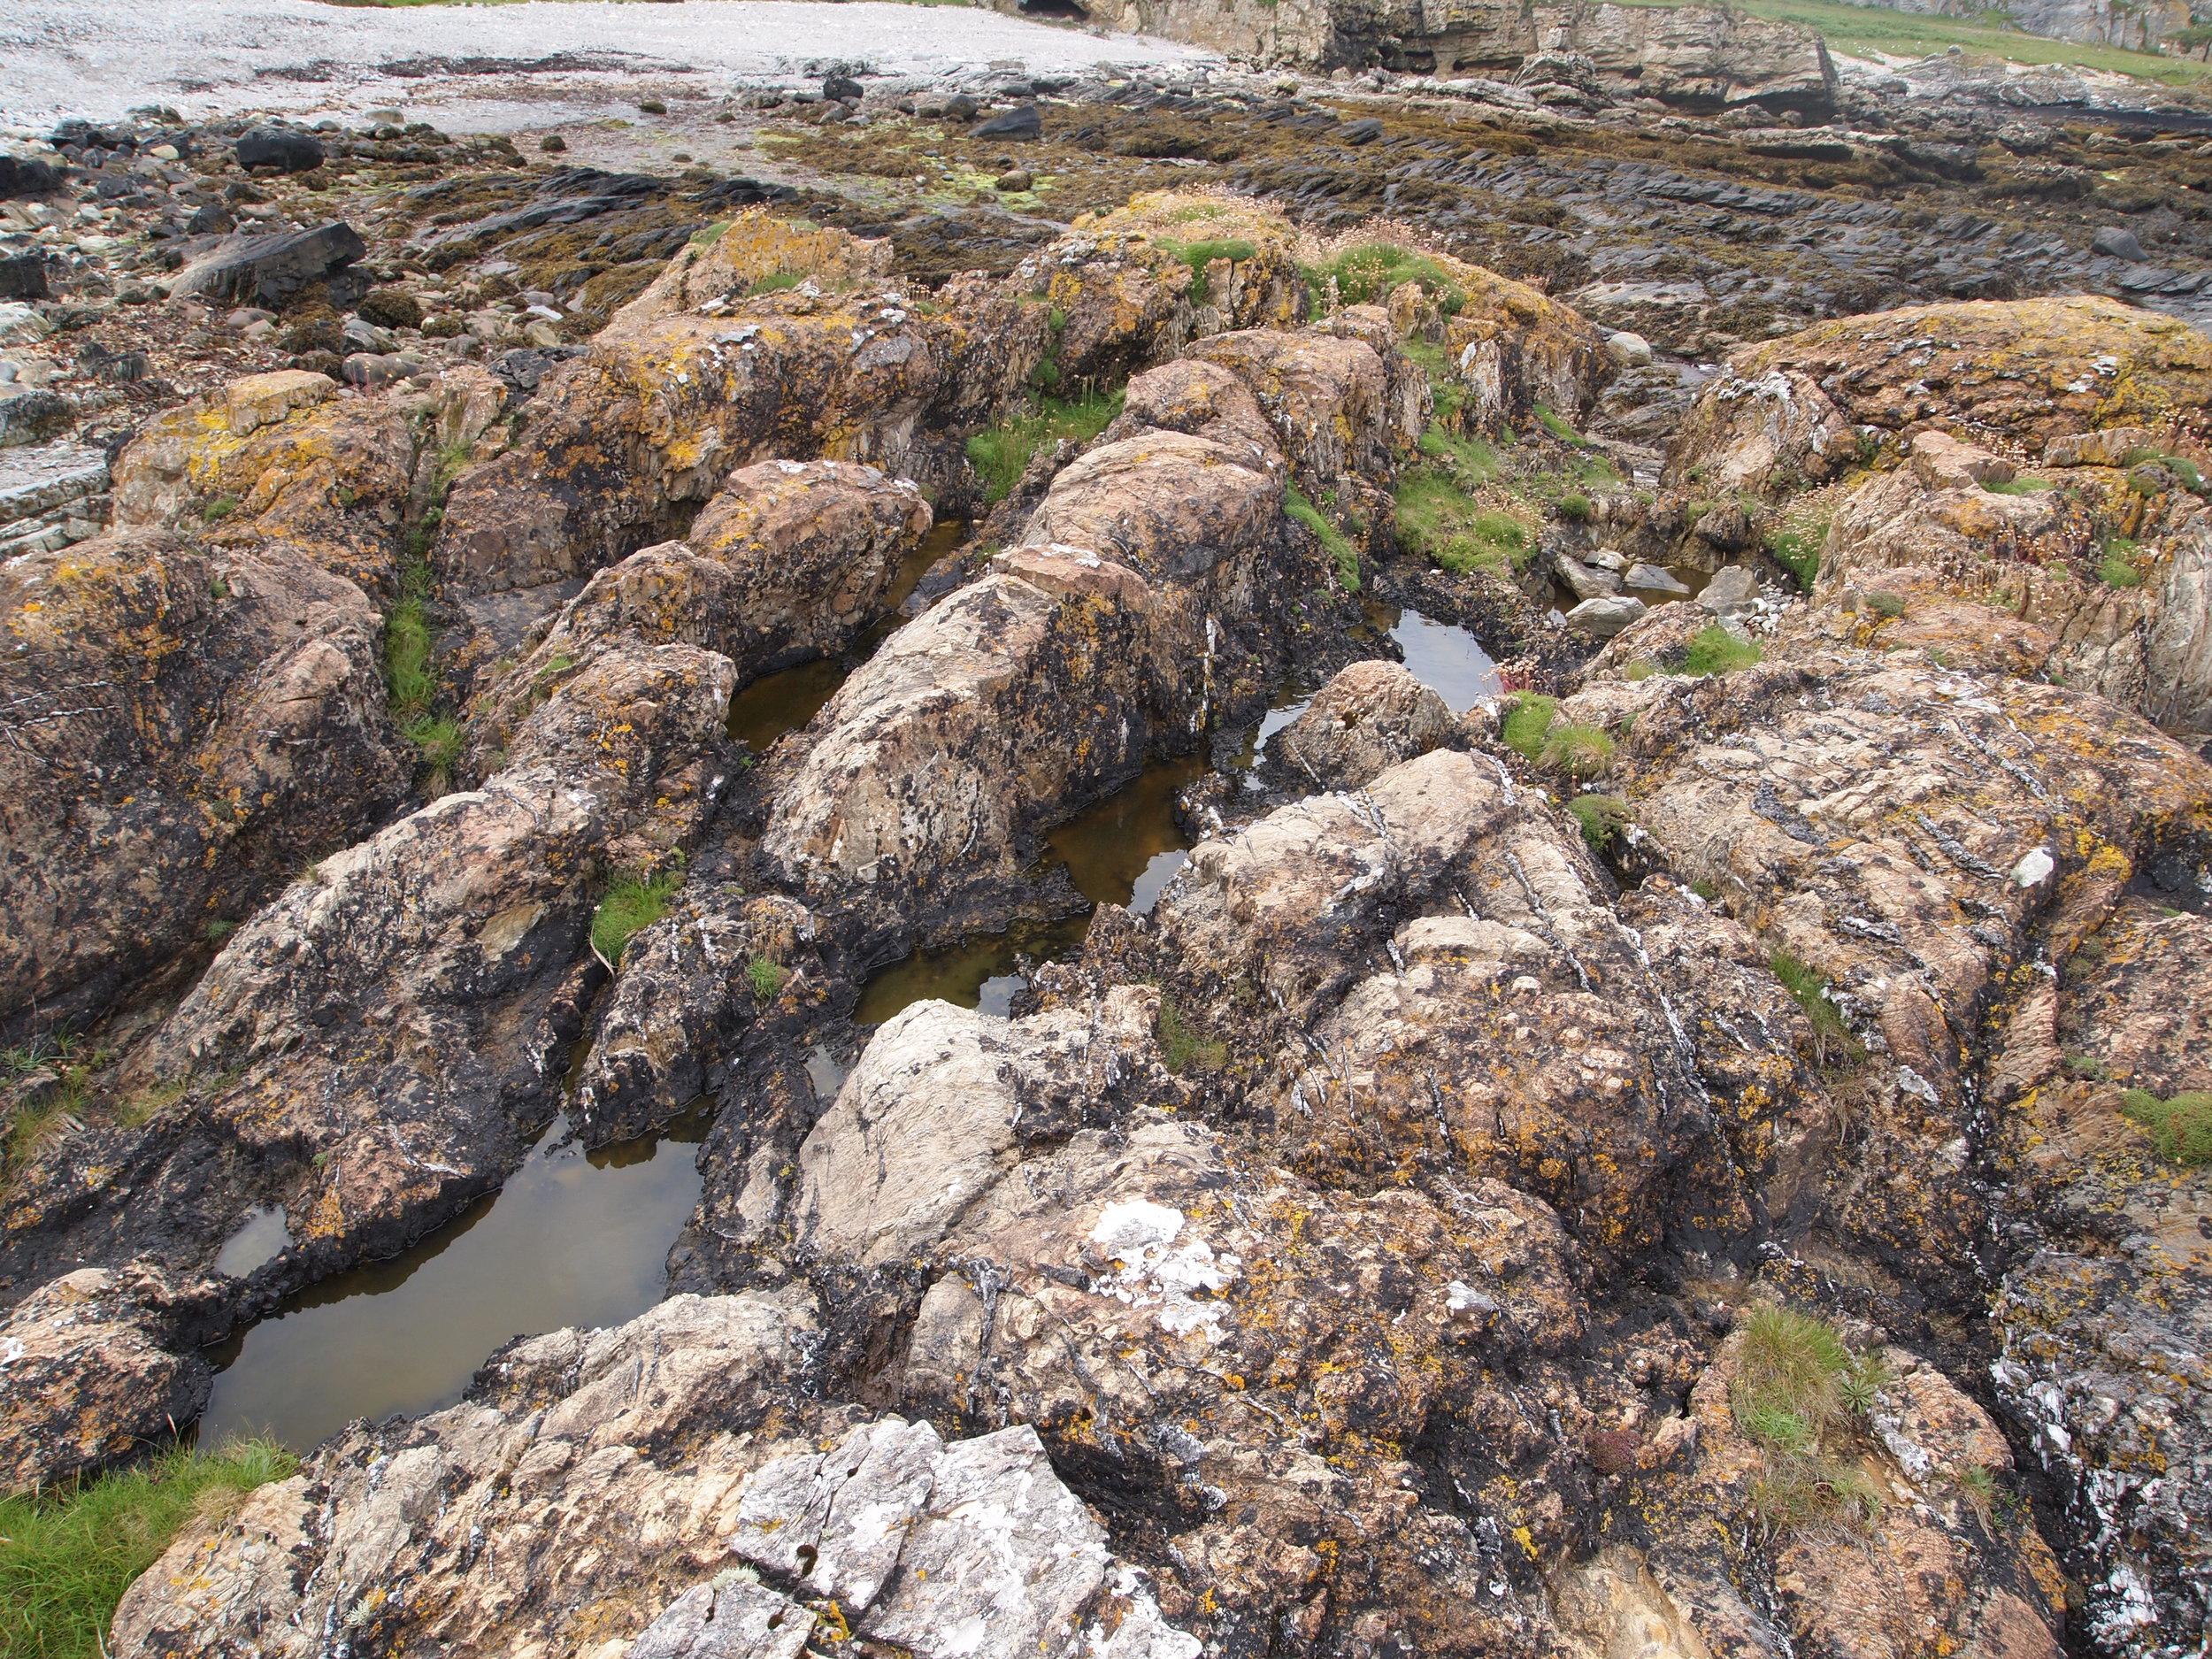 Stromatolites in the Bonahaven Dolomite near Bolsa